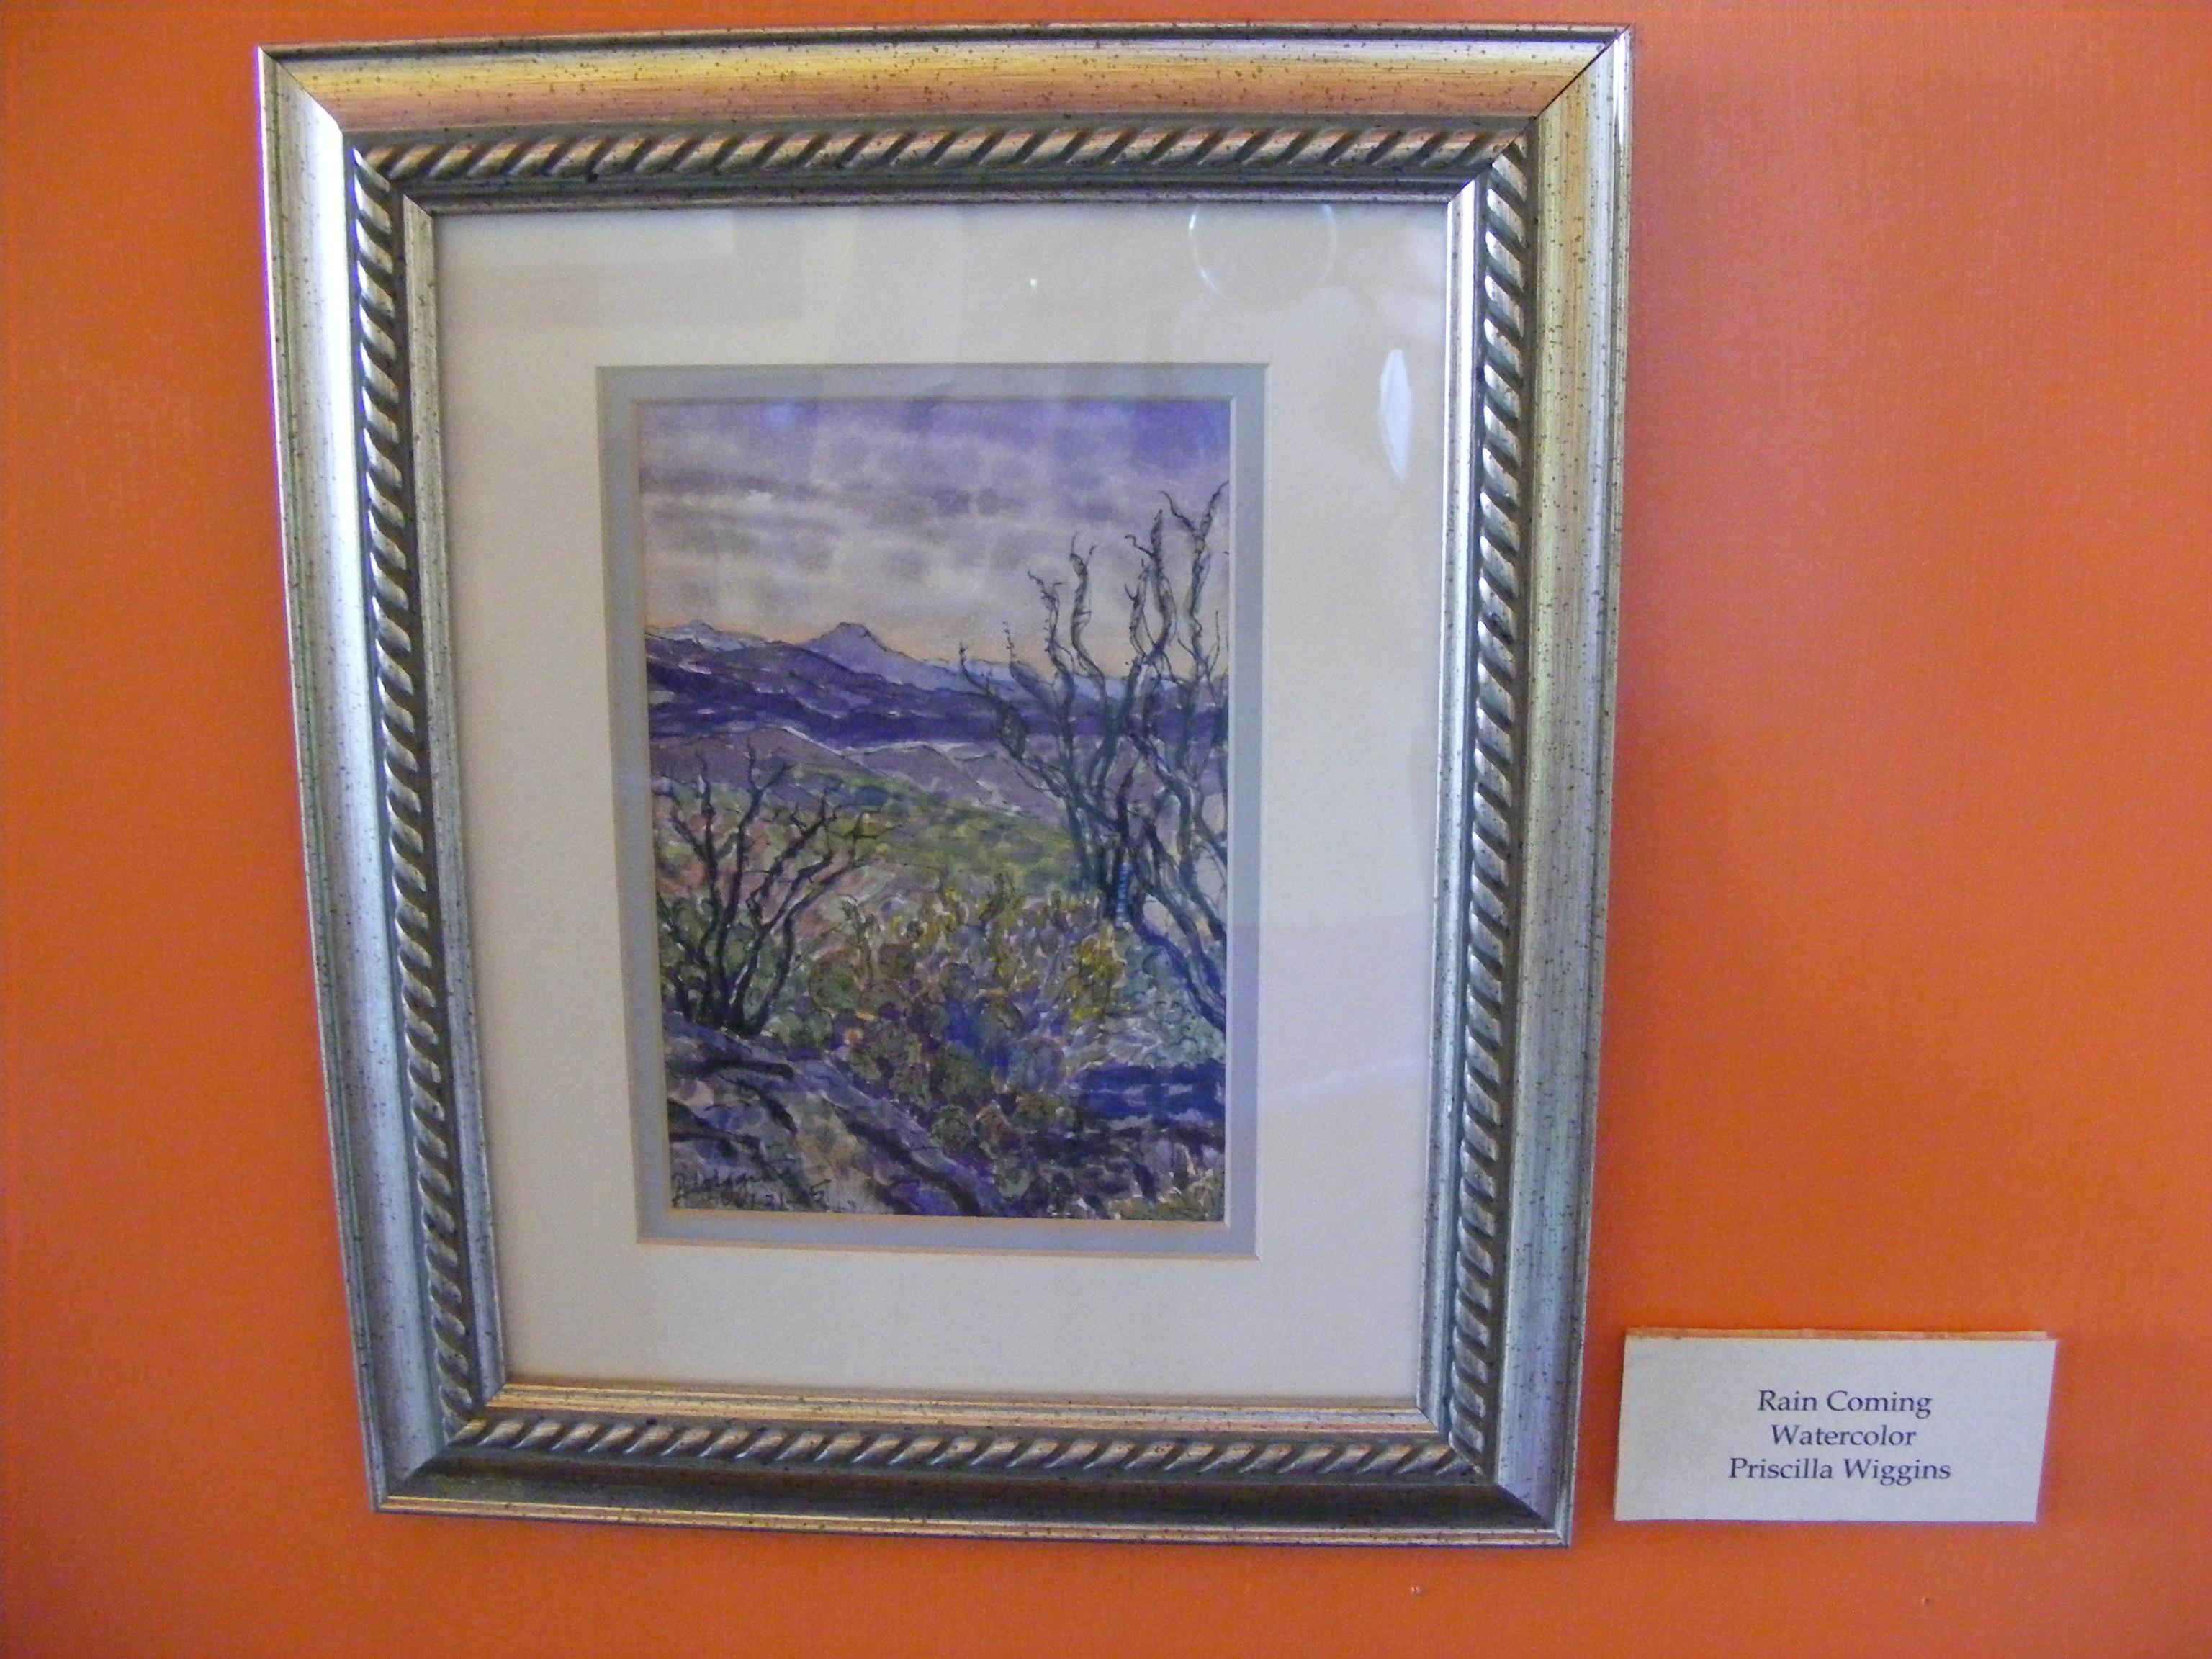 Watercolor art galleries in houston - Rain Coming Watercolor 7 By 10